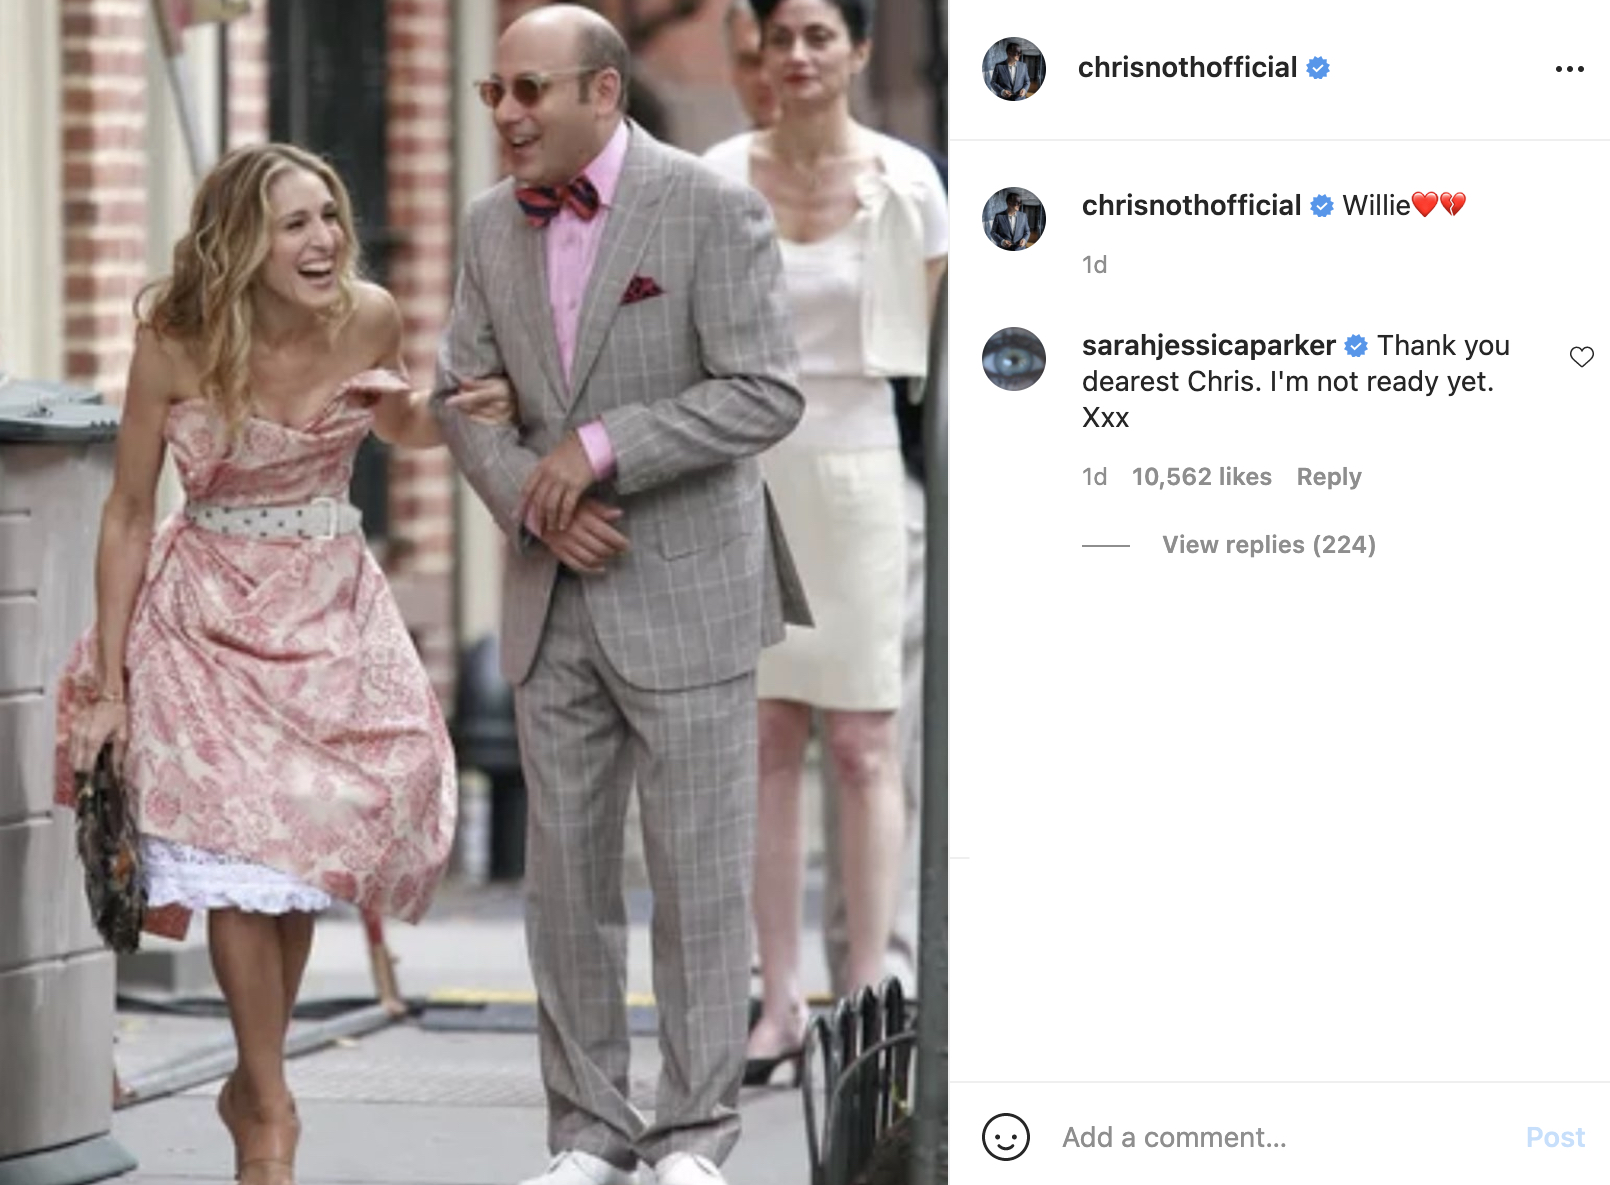 Sarah Jessica Parker, Chris Noth on Instagram about Willie Garson